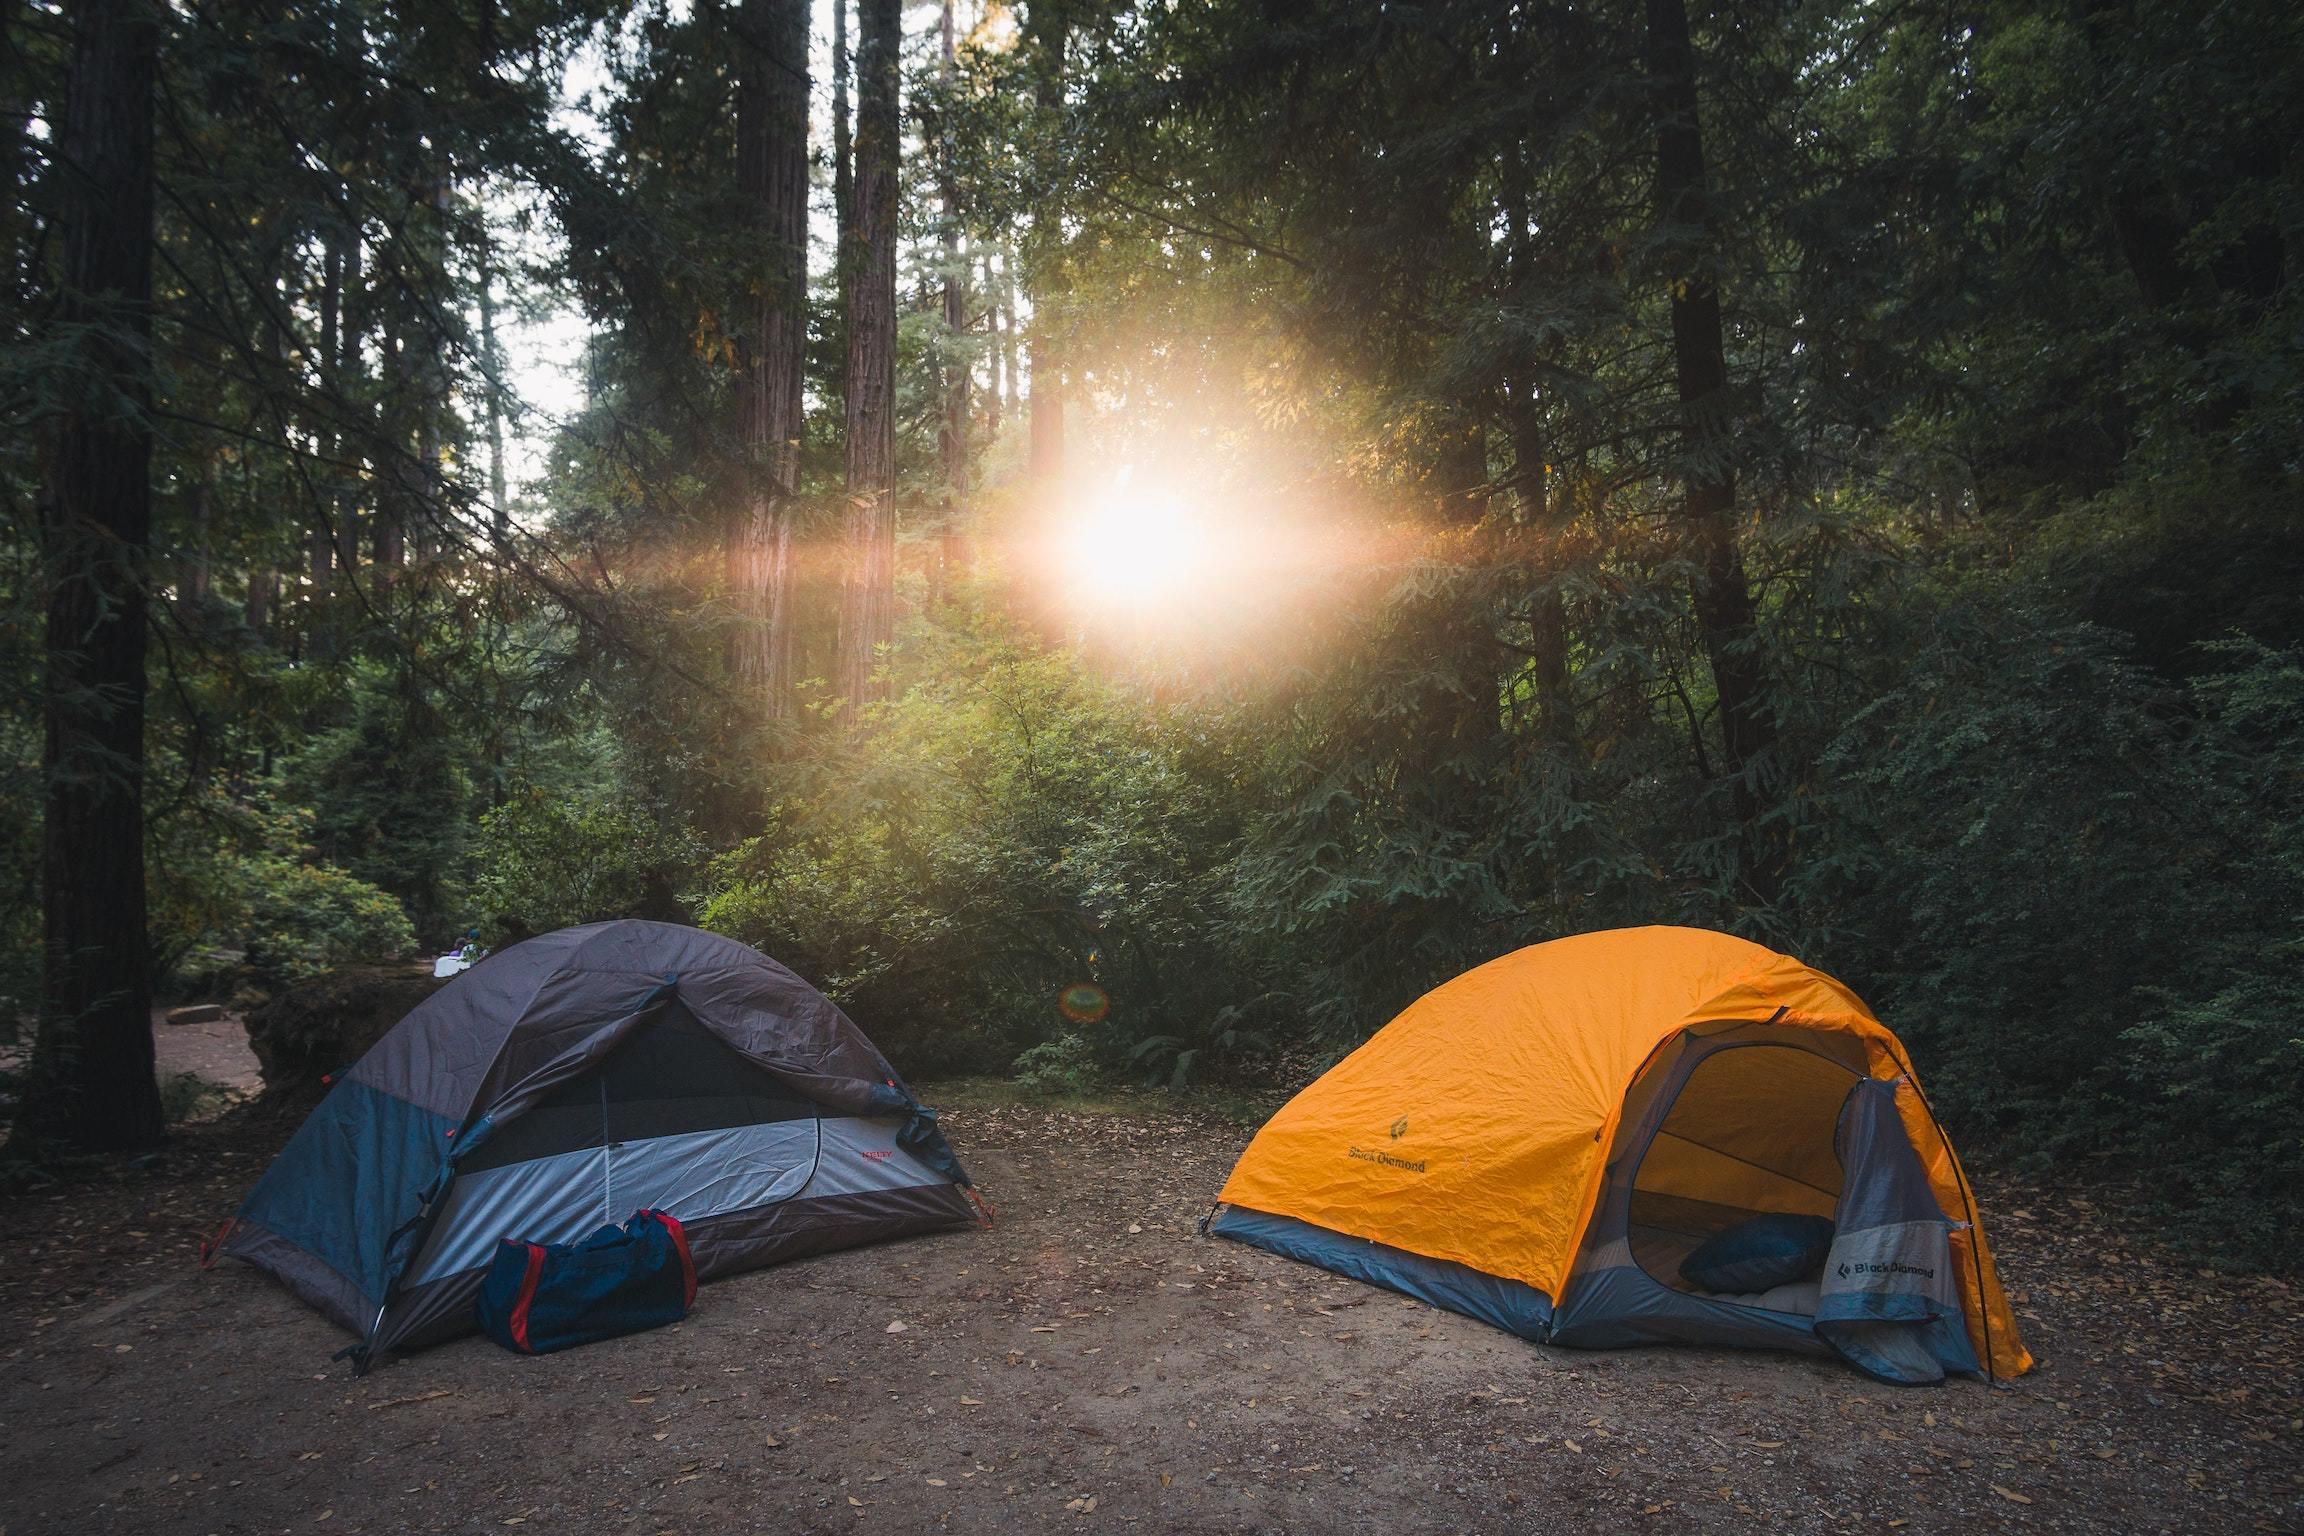 tents, camping